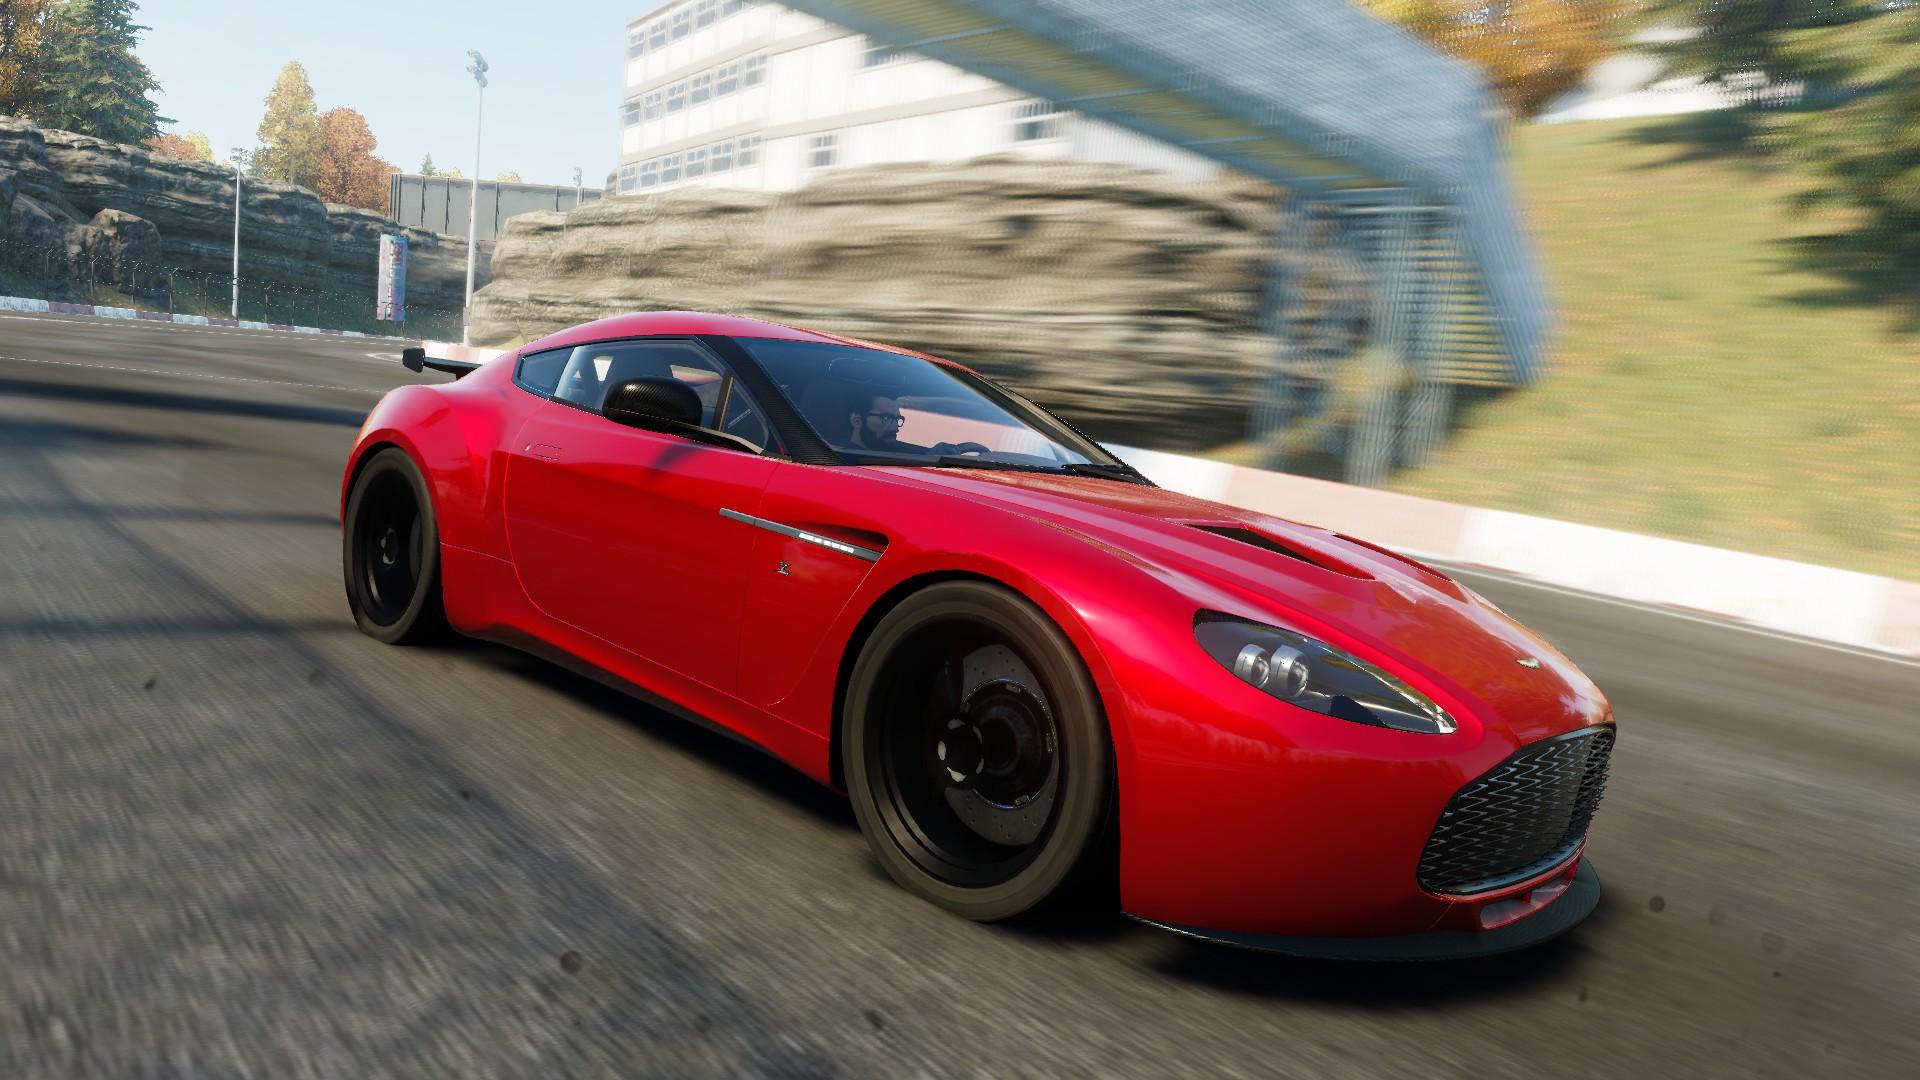 Aston Martin V12 Zagato Backgrounds, Compatible - PC, Mobile, Gadgets| 1920x1080 px